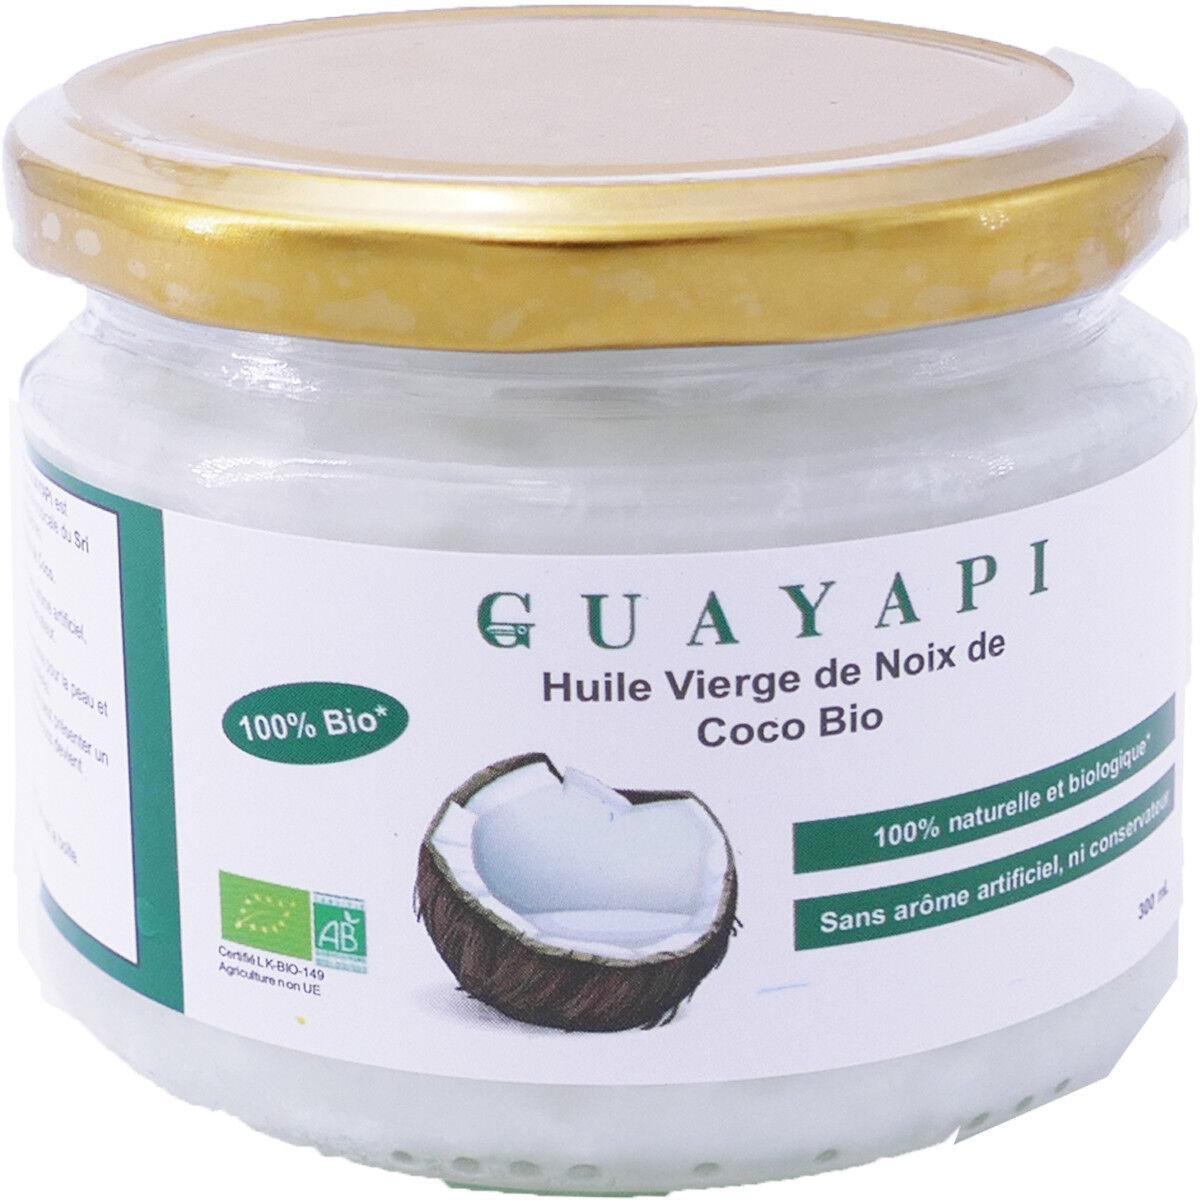 Guayapi huile vierge noix de coco bio 300 ml